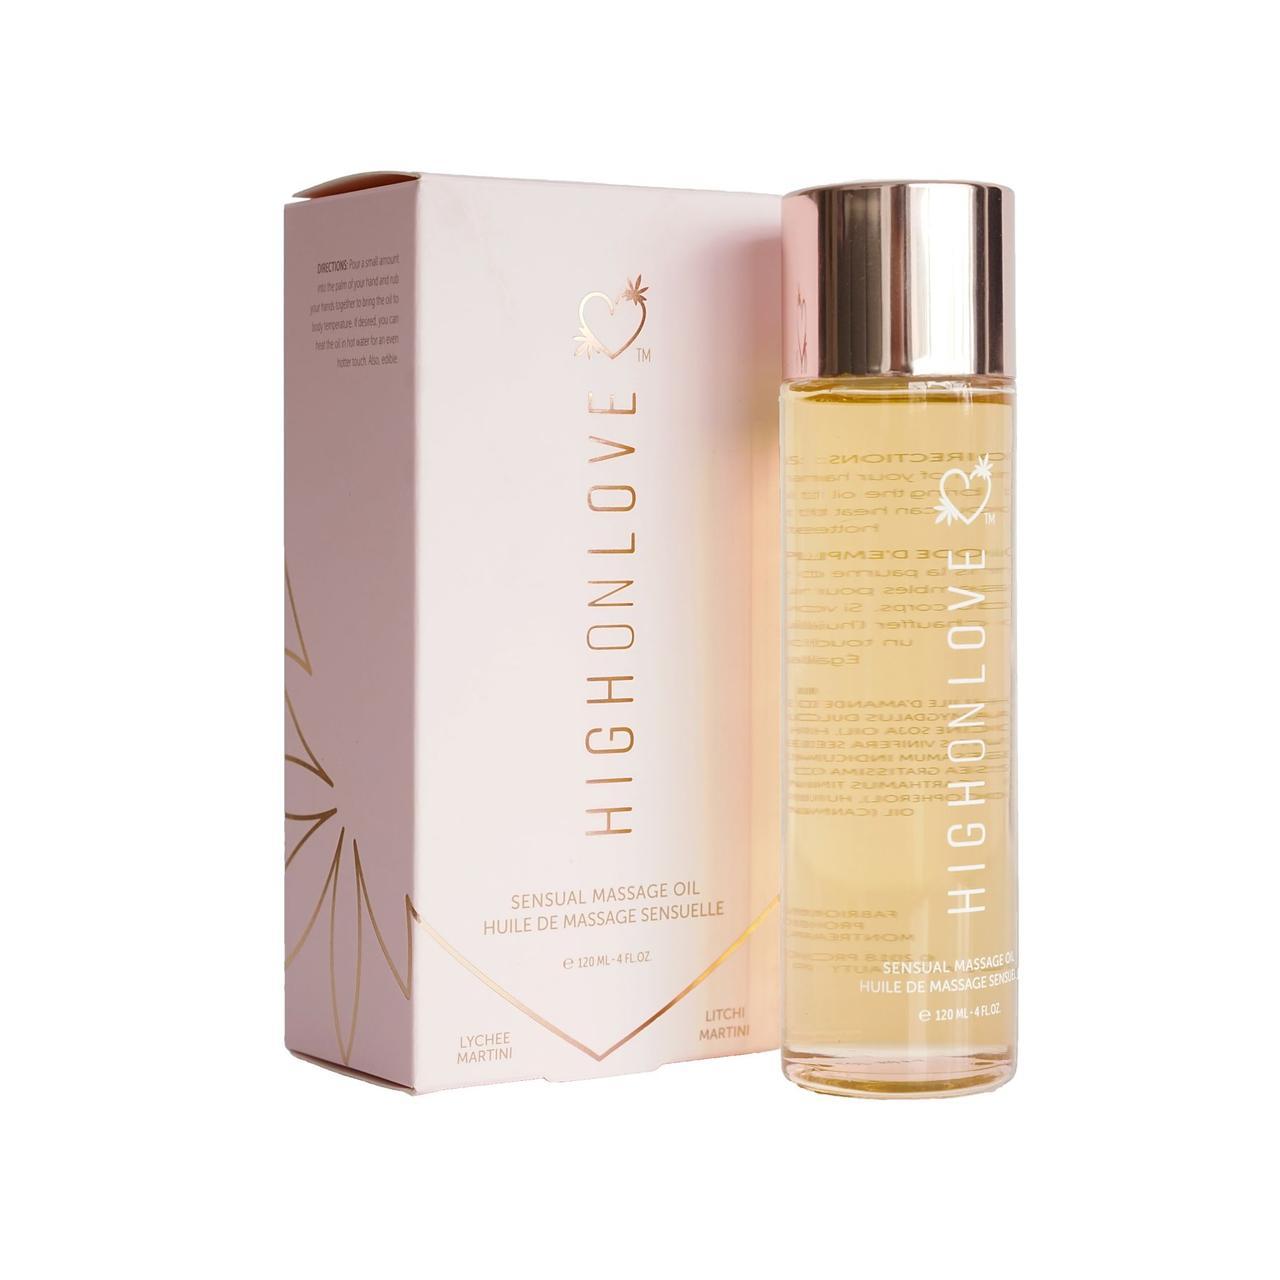 Массажное масло HighOnLove Massage Oil - Lychee Martini (120 мл) с маслом семян конопли